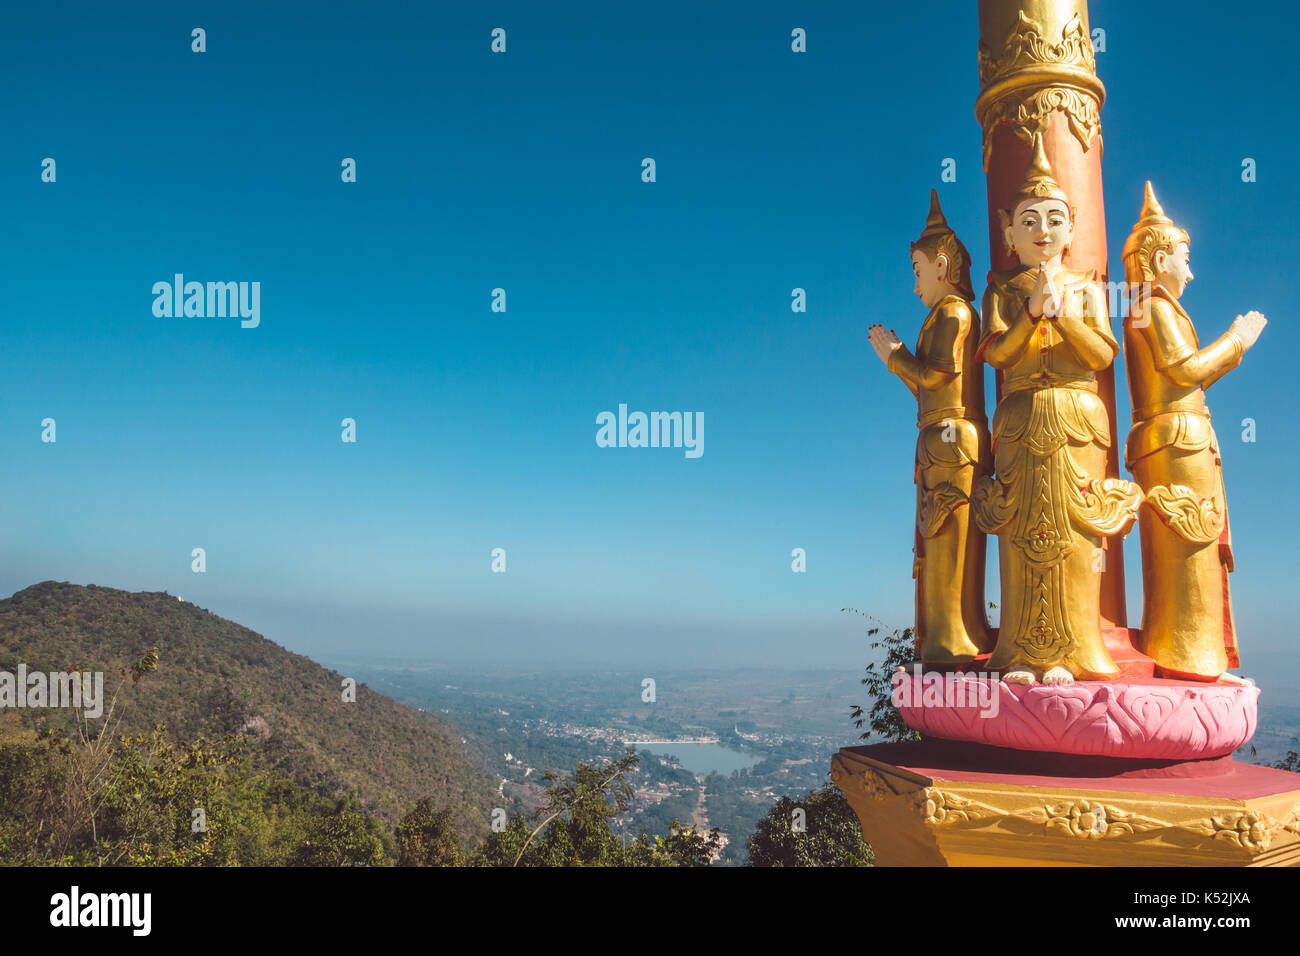 Buddhist statues overlooking Lake Pindaya in Shan State, Myanmar (Burma) 2013. - Stock Image